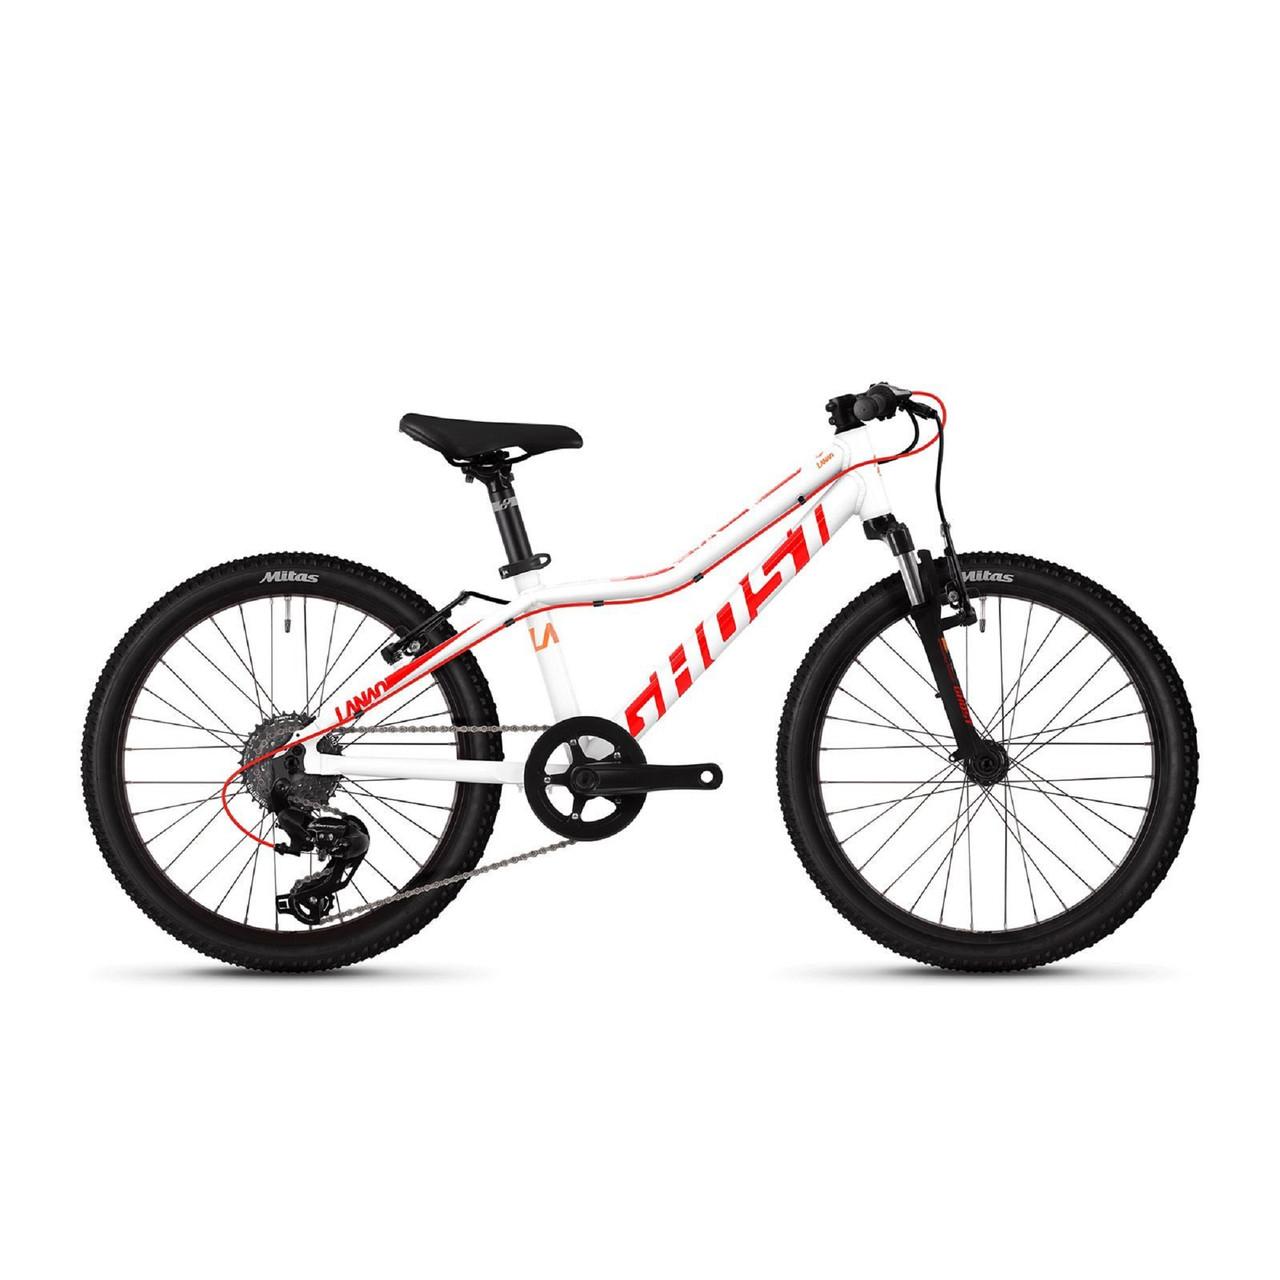 "Велосипед Ghost Lanao 2.0 AL W 20"" , бело-красно-оранжевый, 2019"